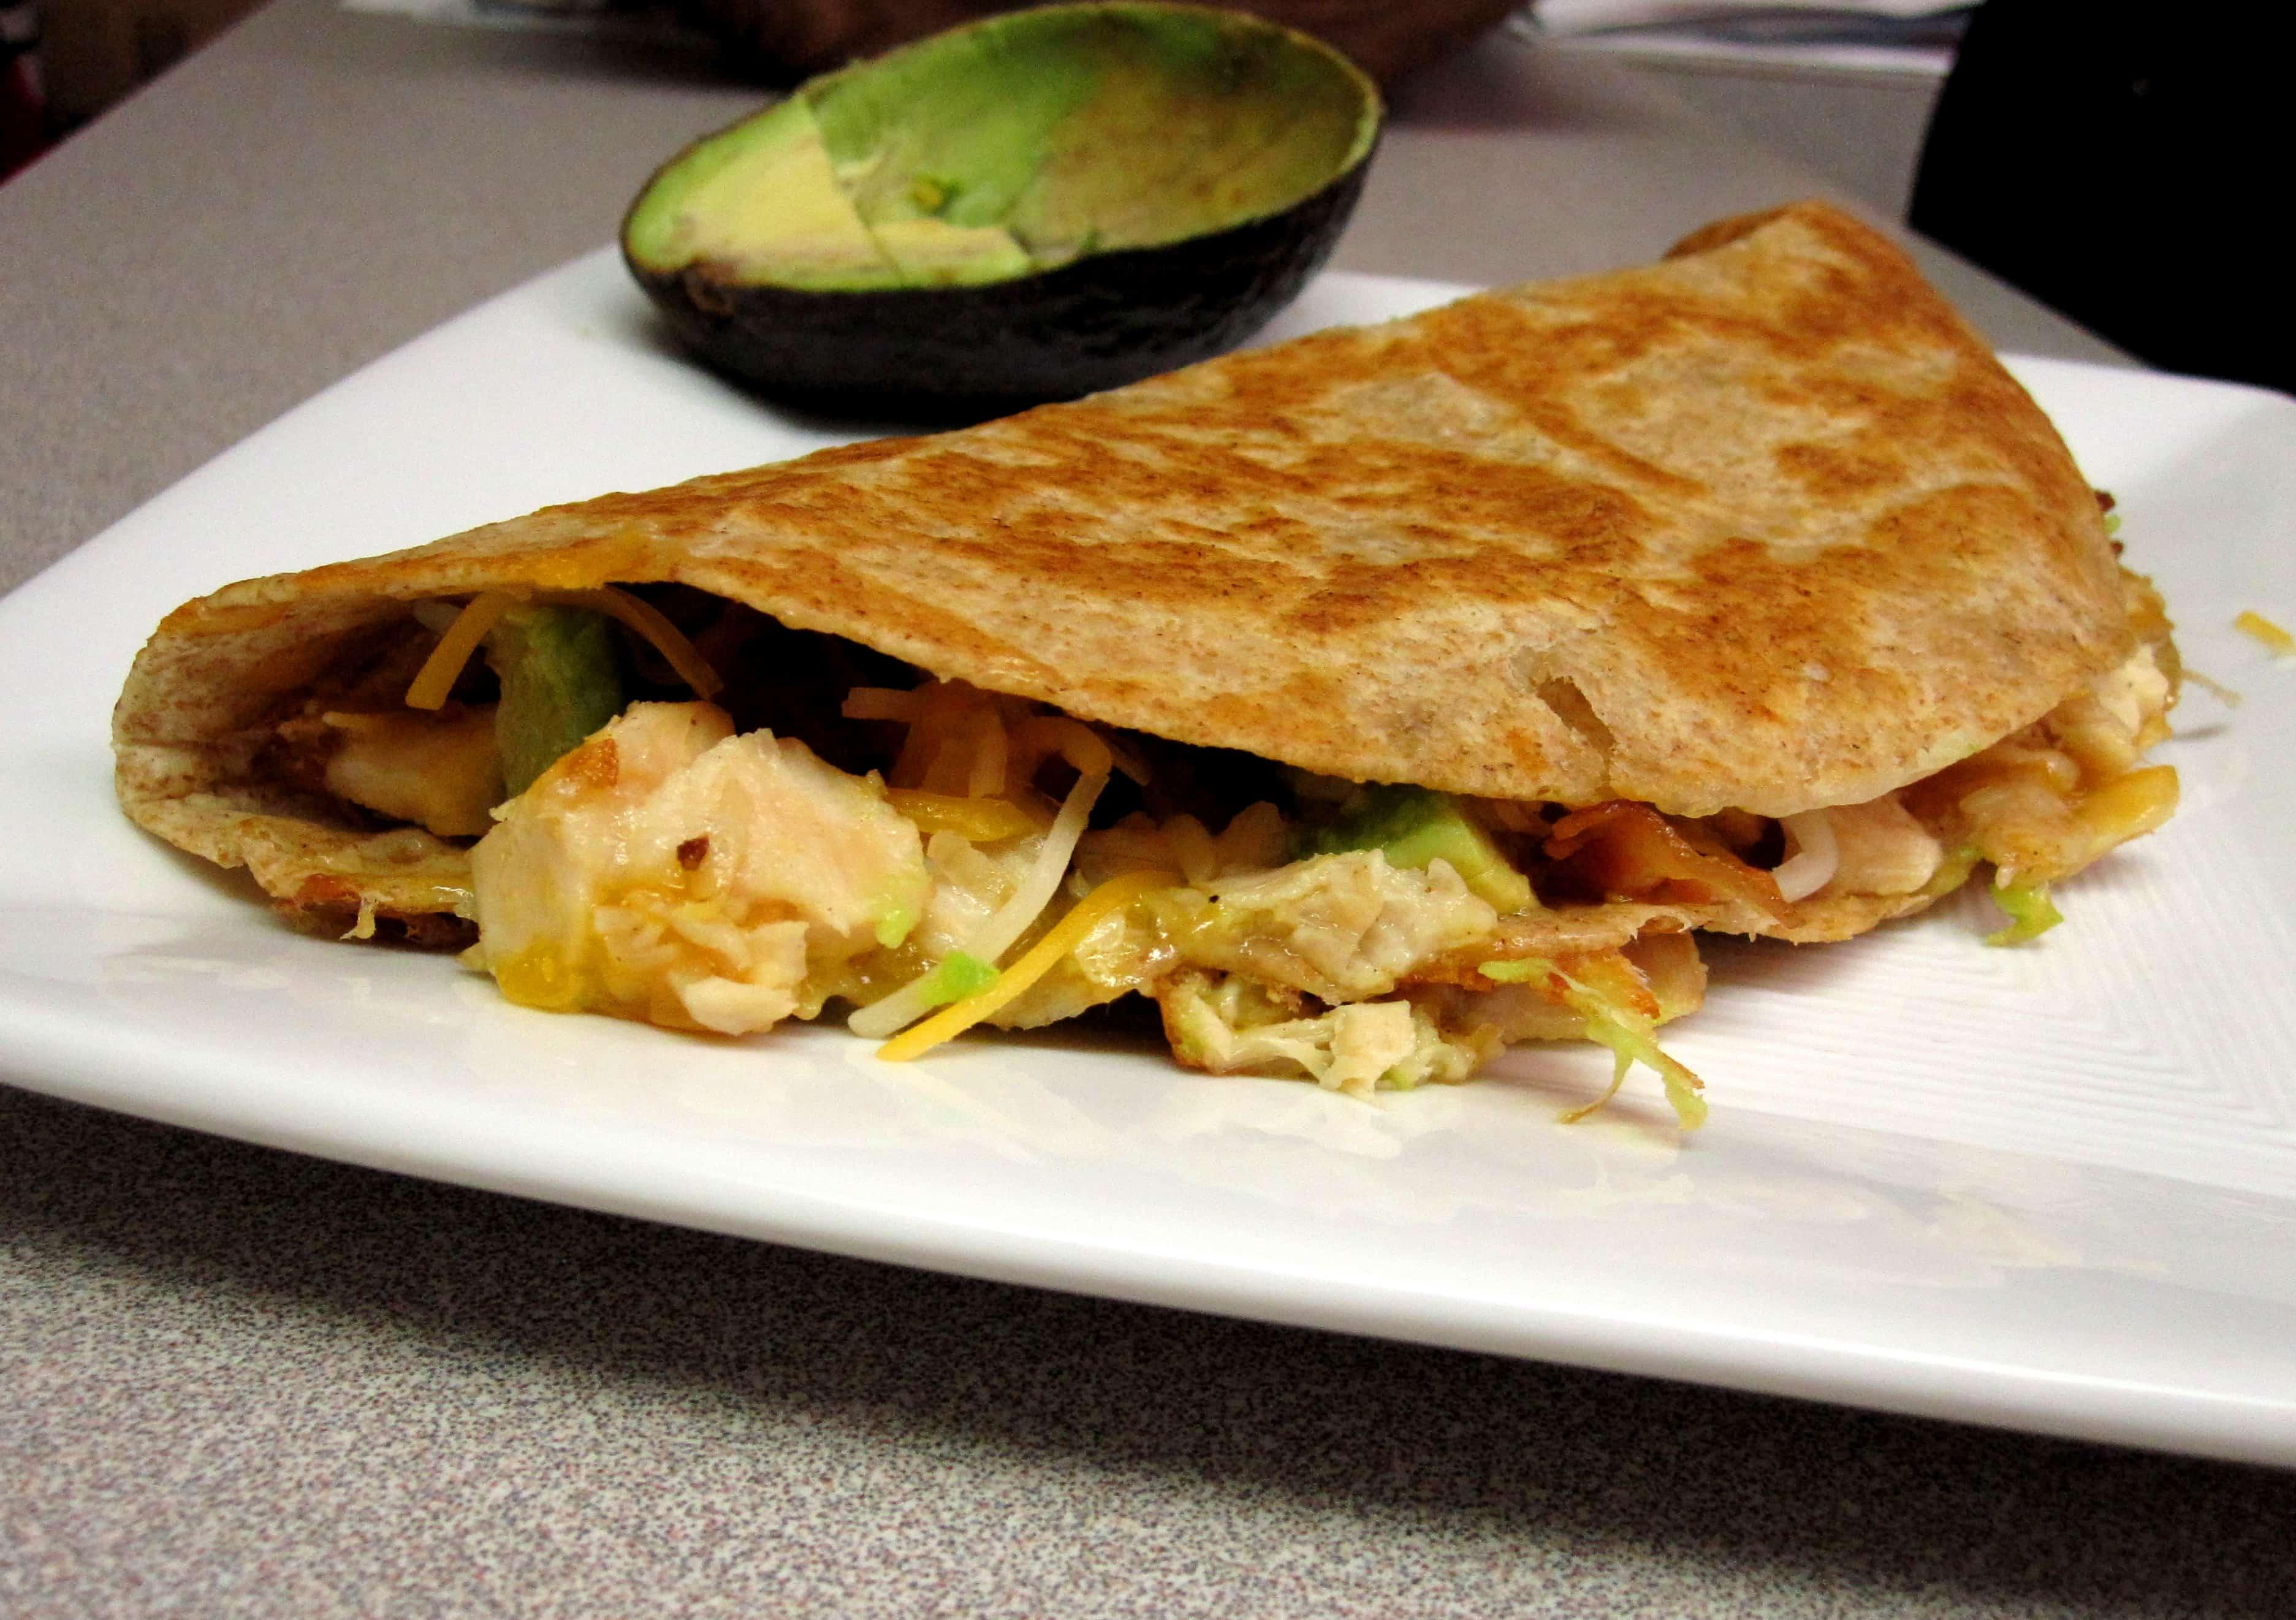 Cheesy Chicken, Bacon & Avocado Quesadillas | The Spiffy Cookie